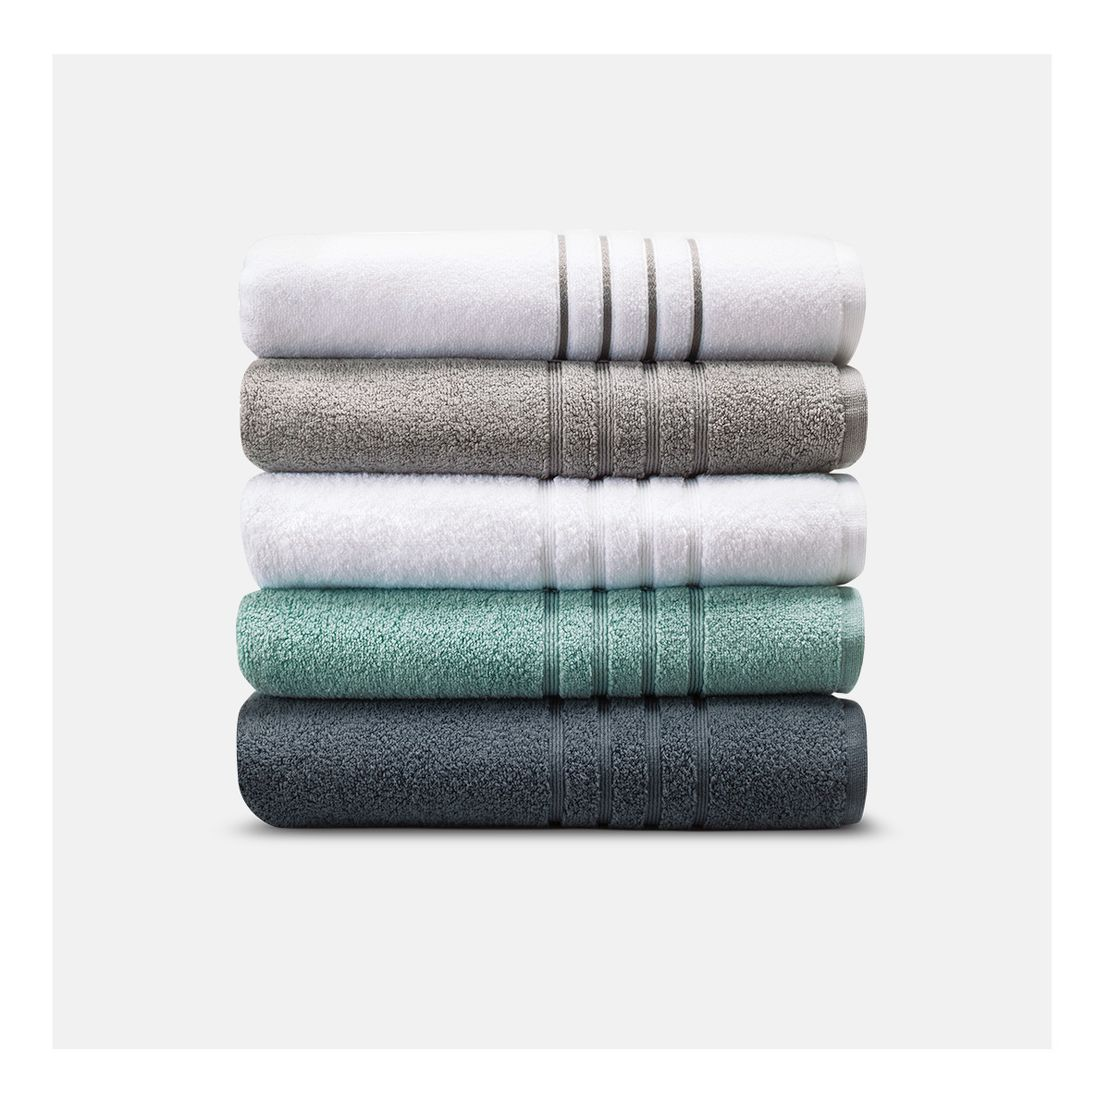 Our top bath towels